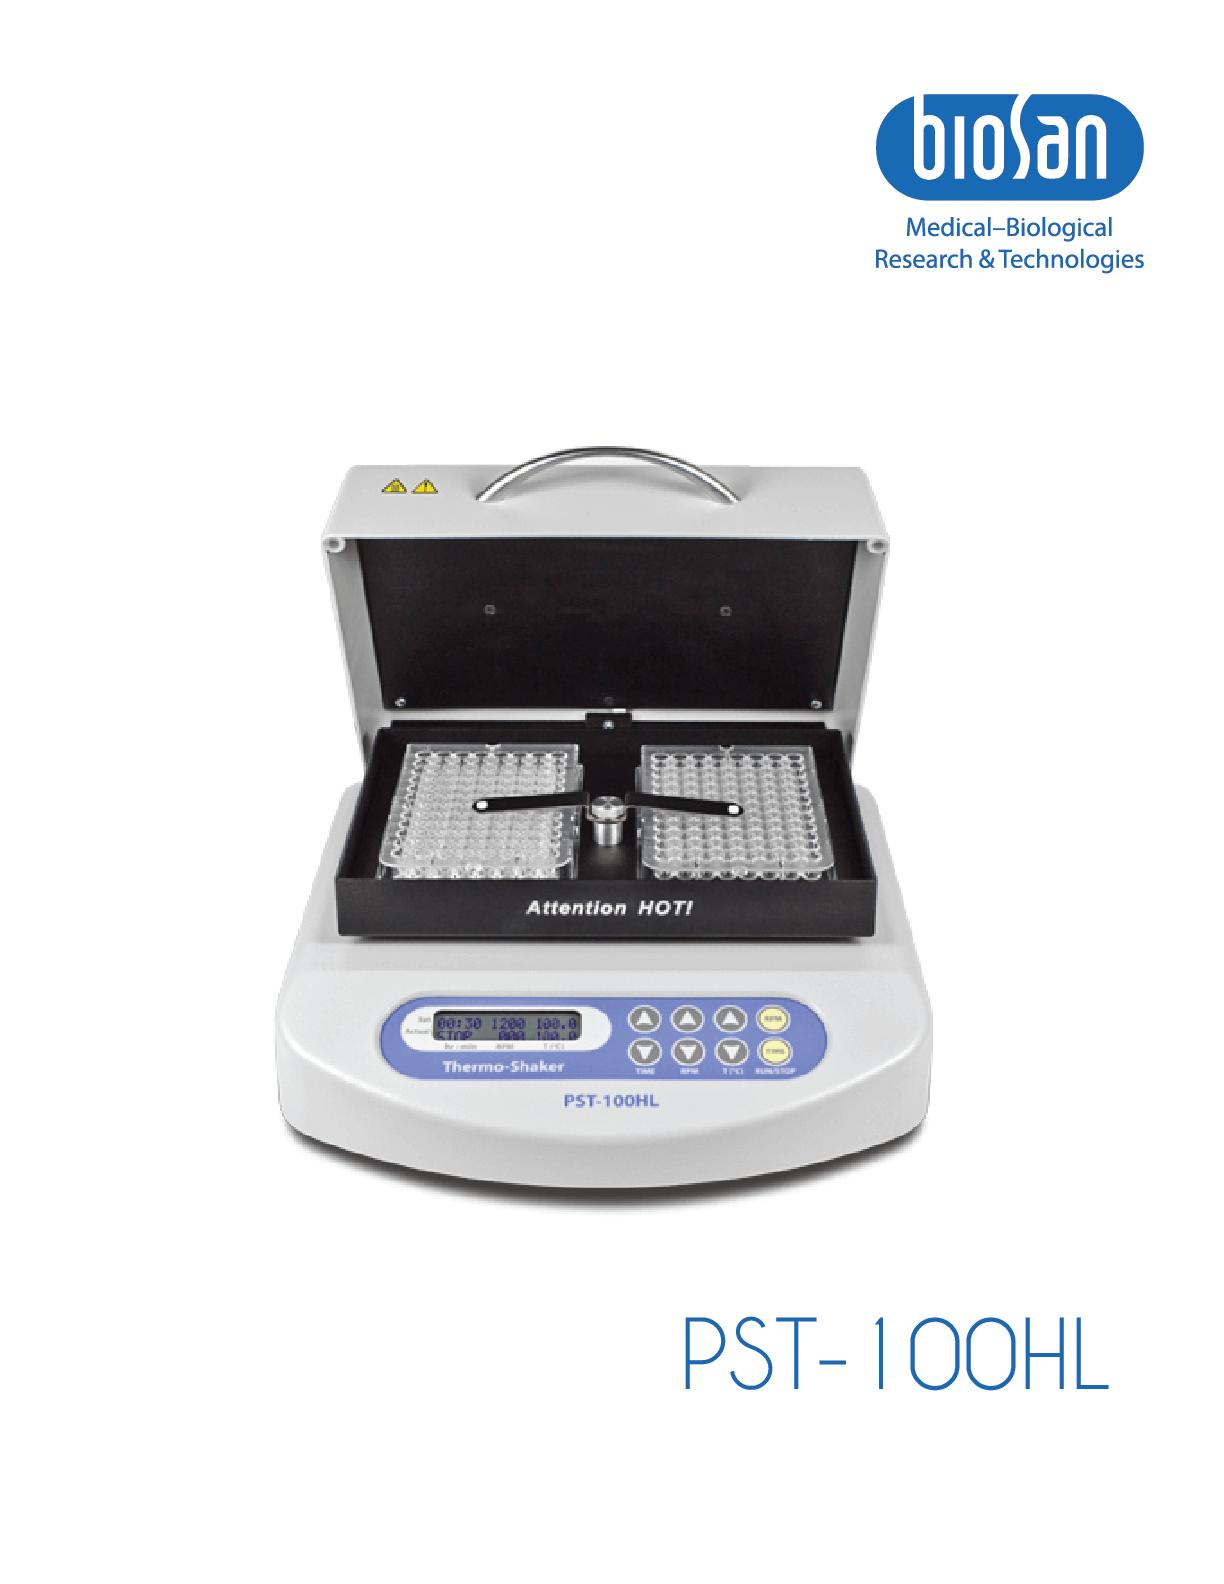 PST-100HL, Plate Shaker Thermostat